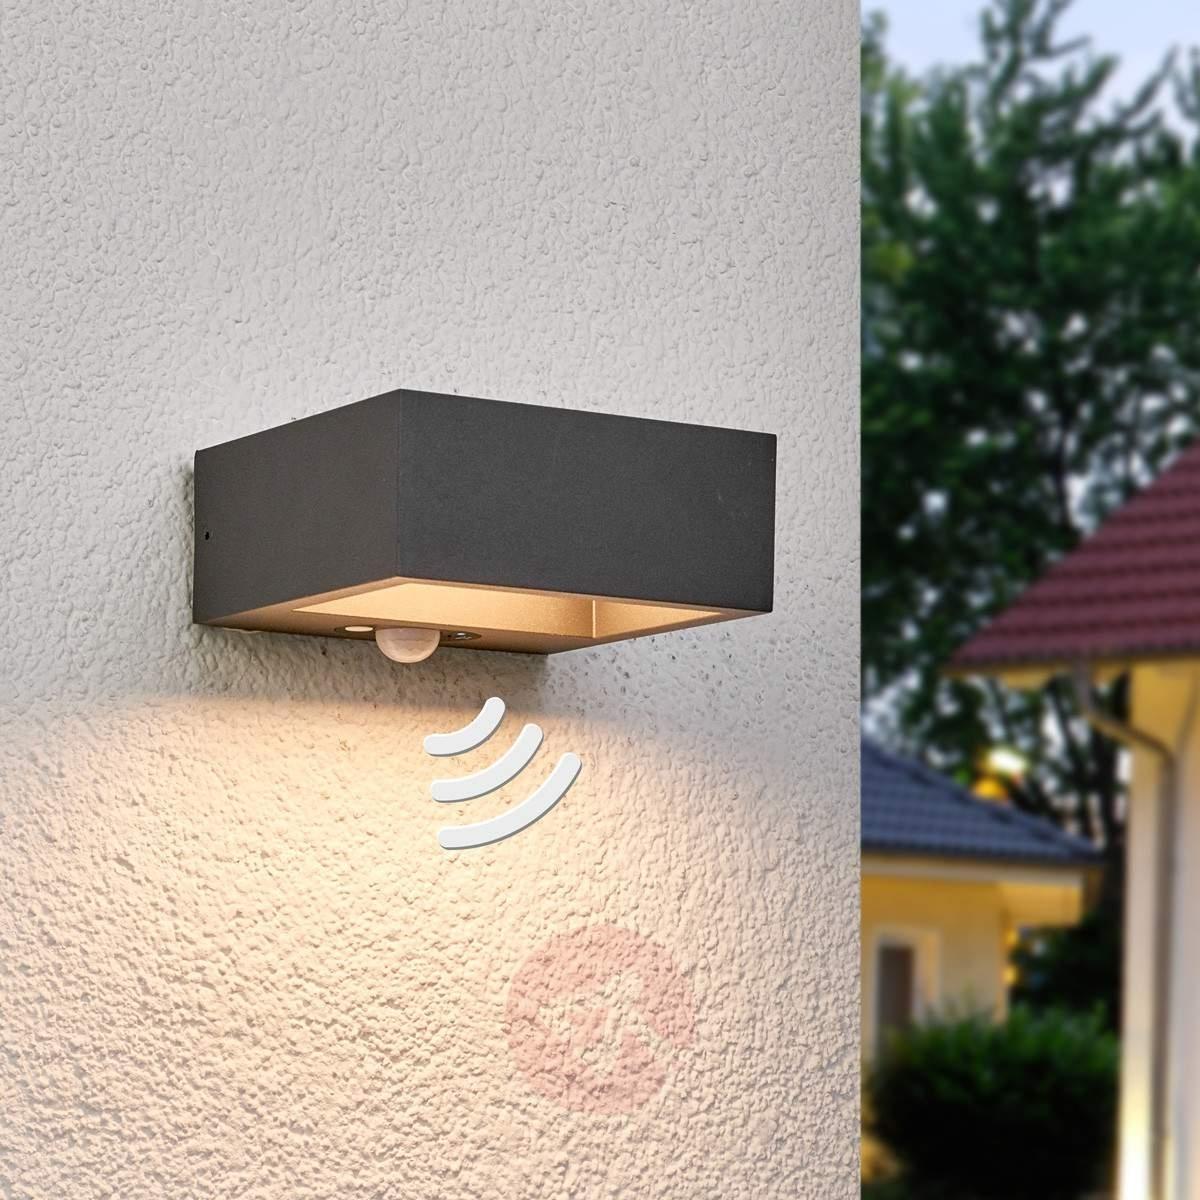 Modern Small Outdoor Solar Lights Inside Recent Solar Powered Led Outdoor Wall Light Mahra, Sensor (View 17 of 20)